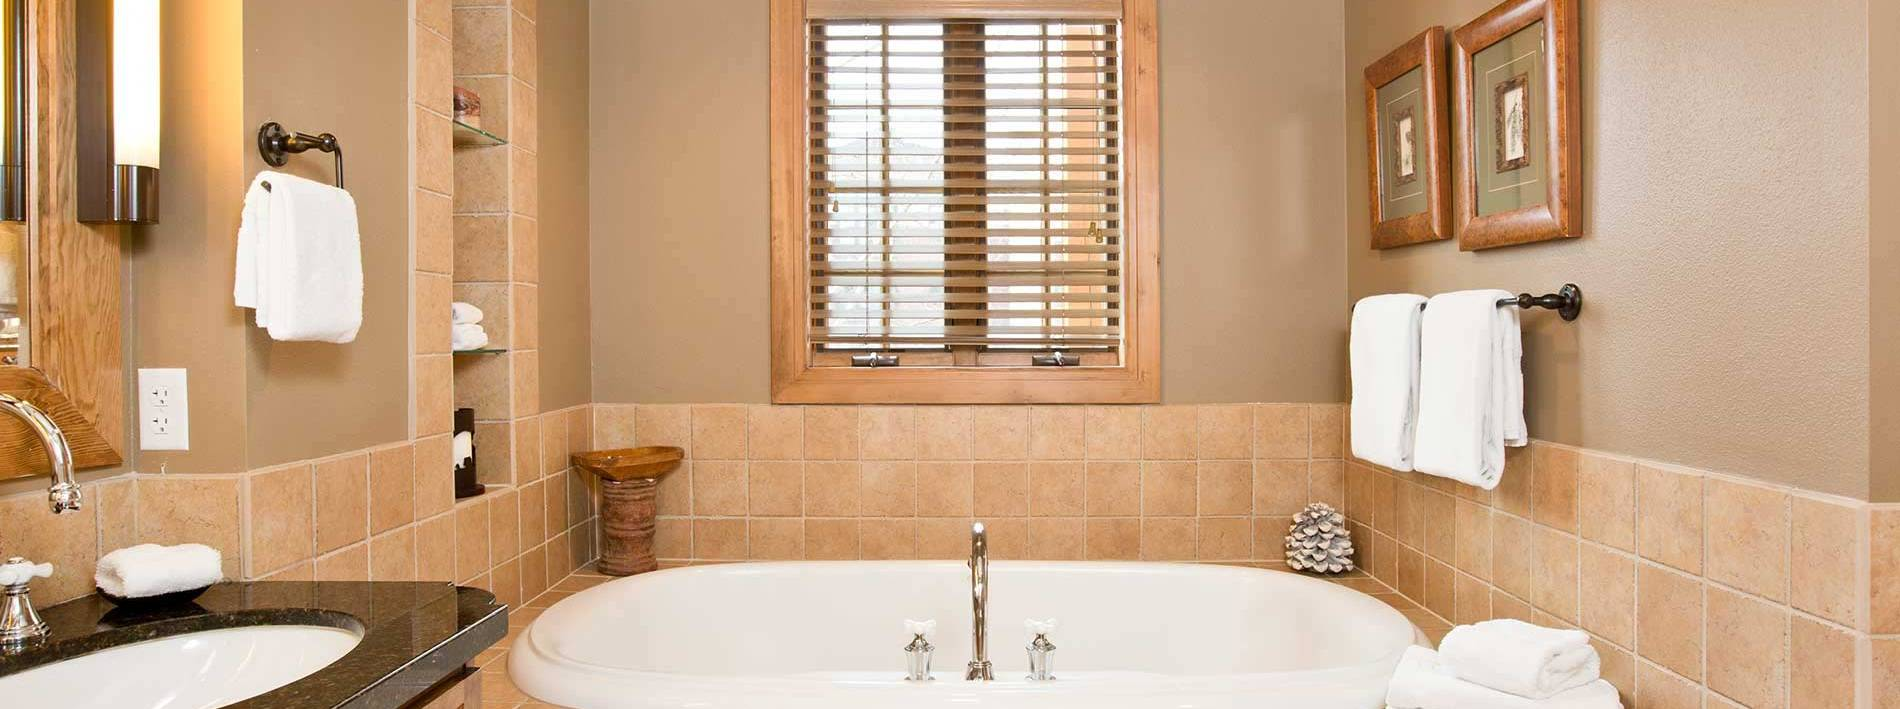 Spacious bathroom with a large tub